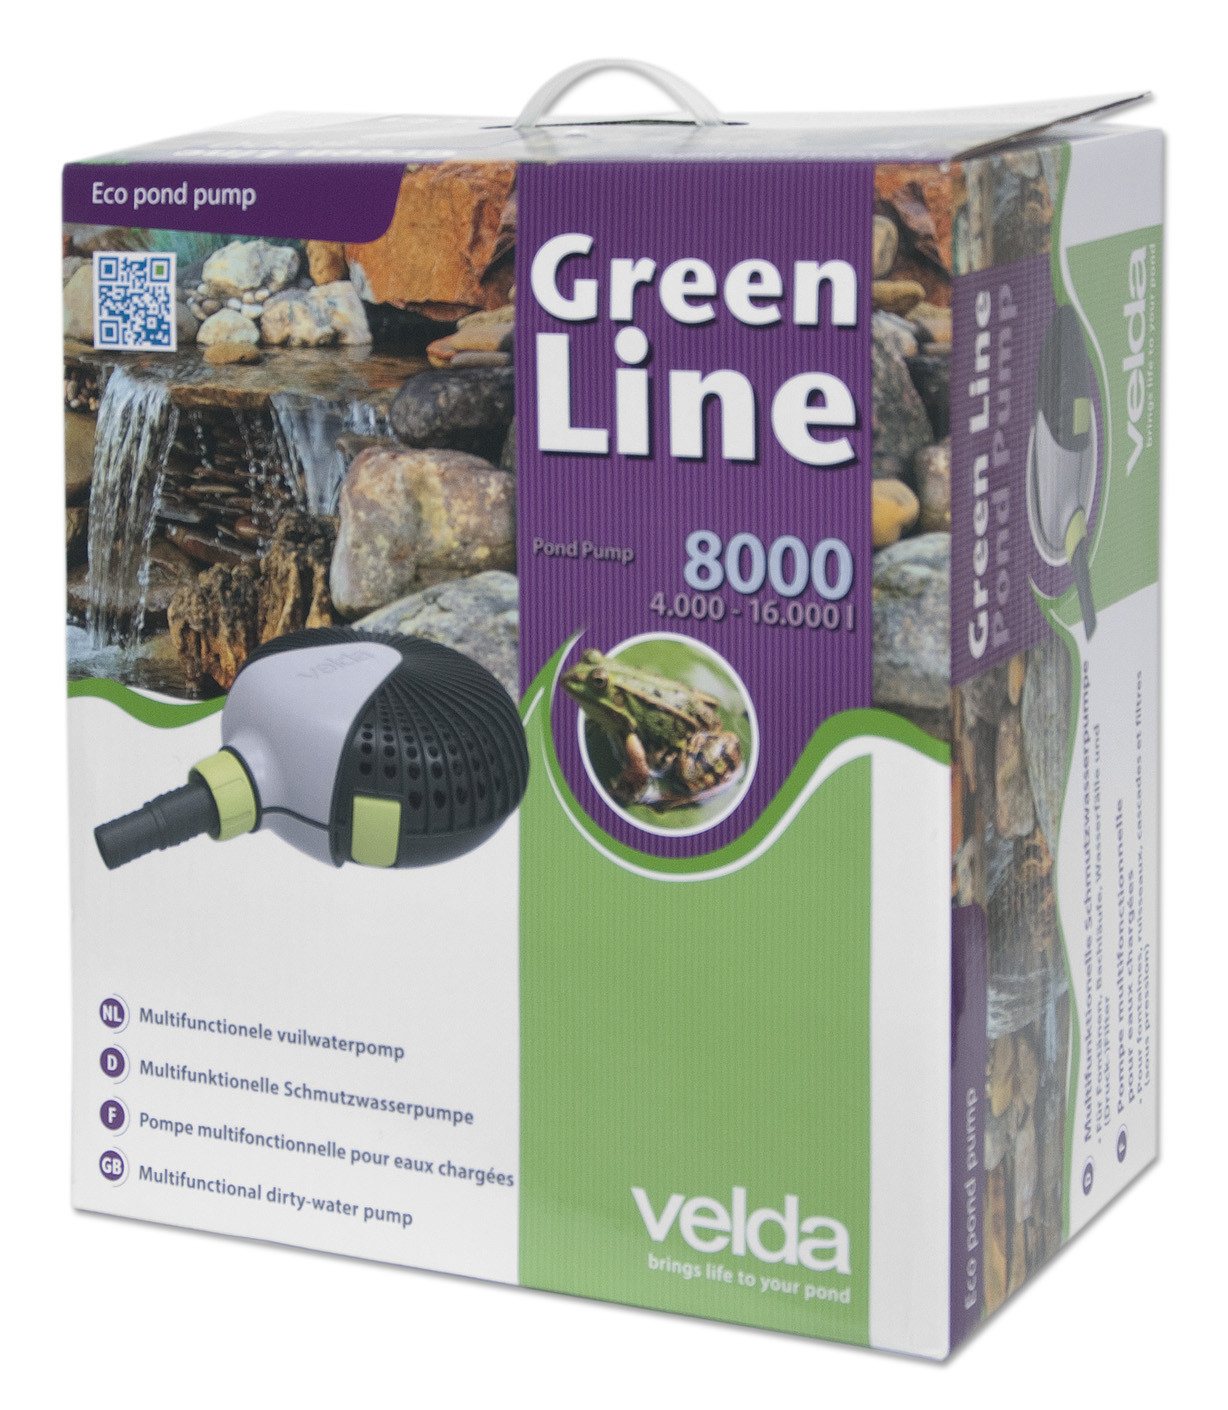 Velda Green Line 8000